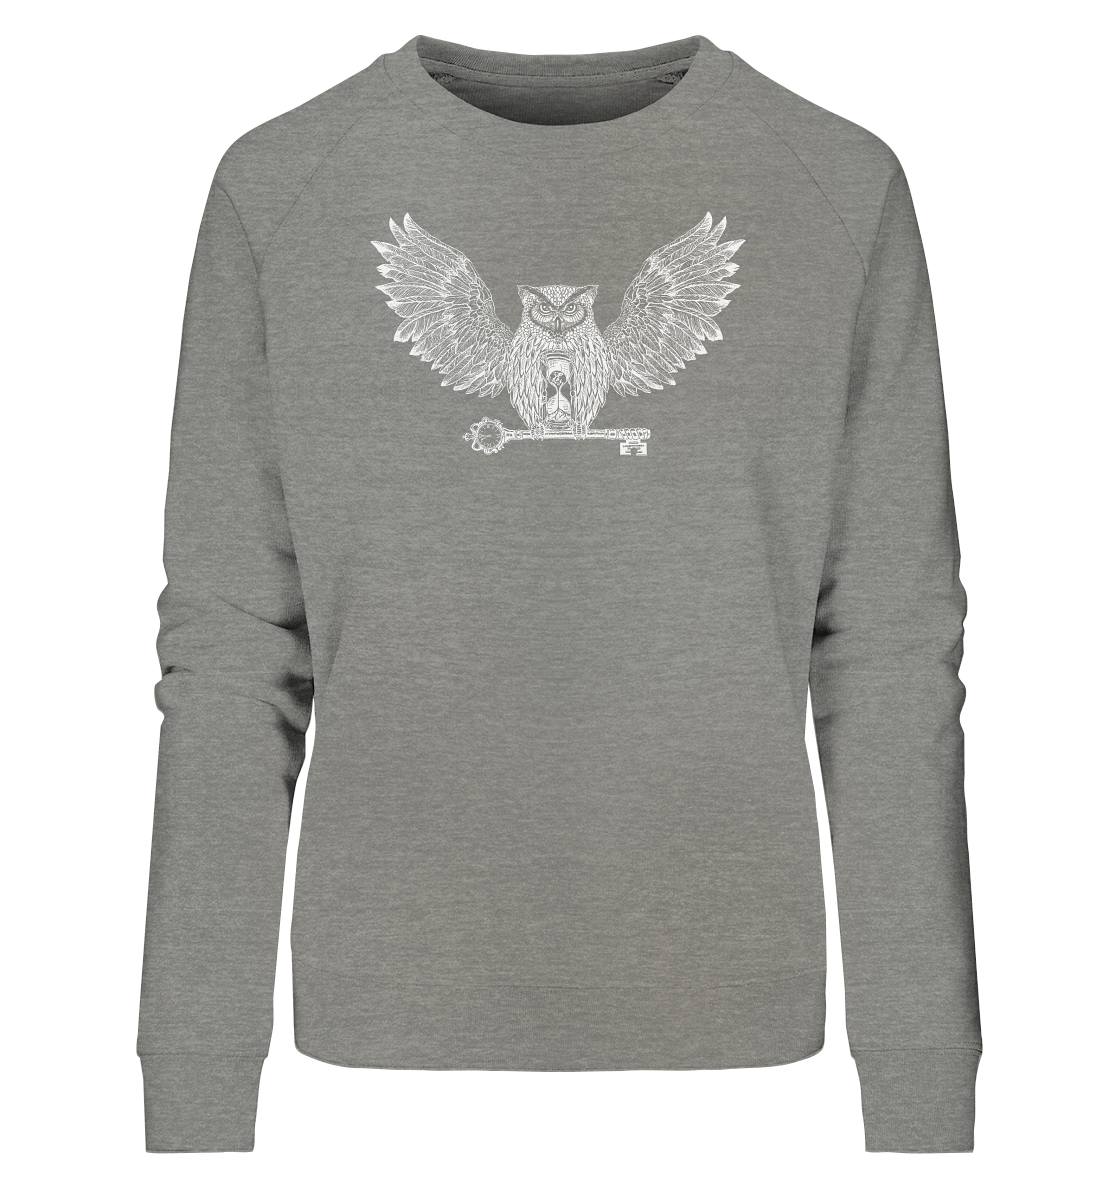 front-ladies-organic-sweatshirt-818381-1116x-9.png